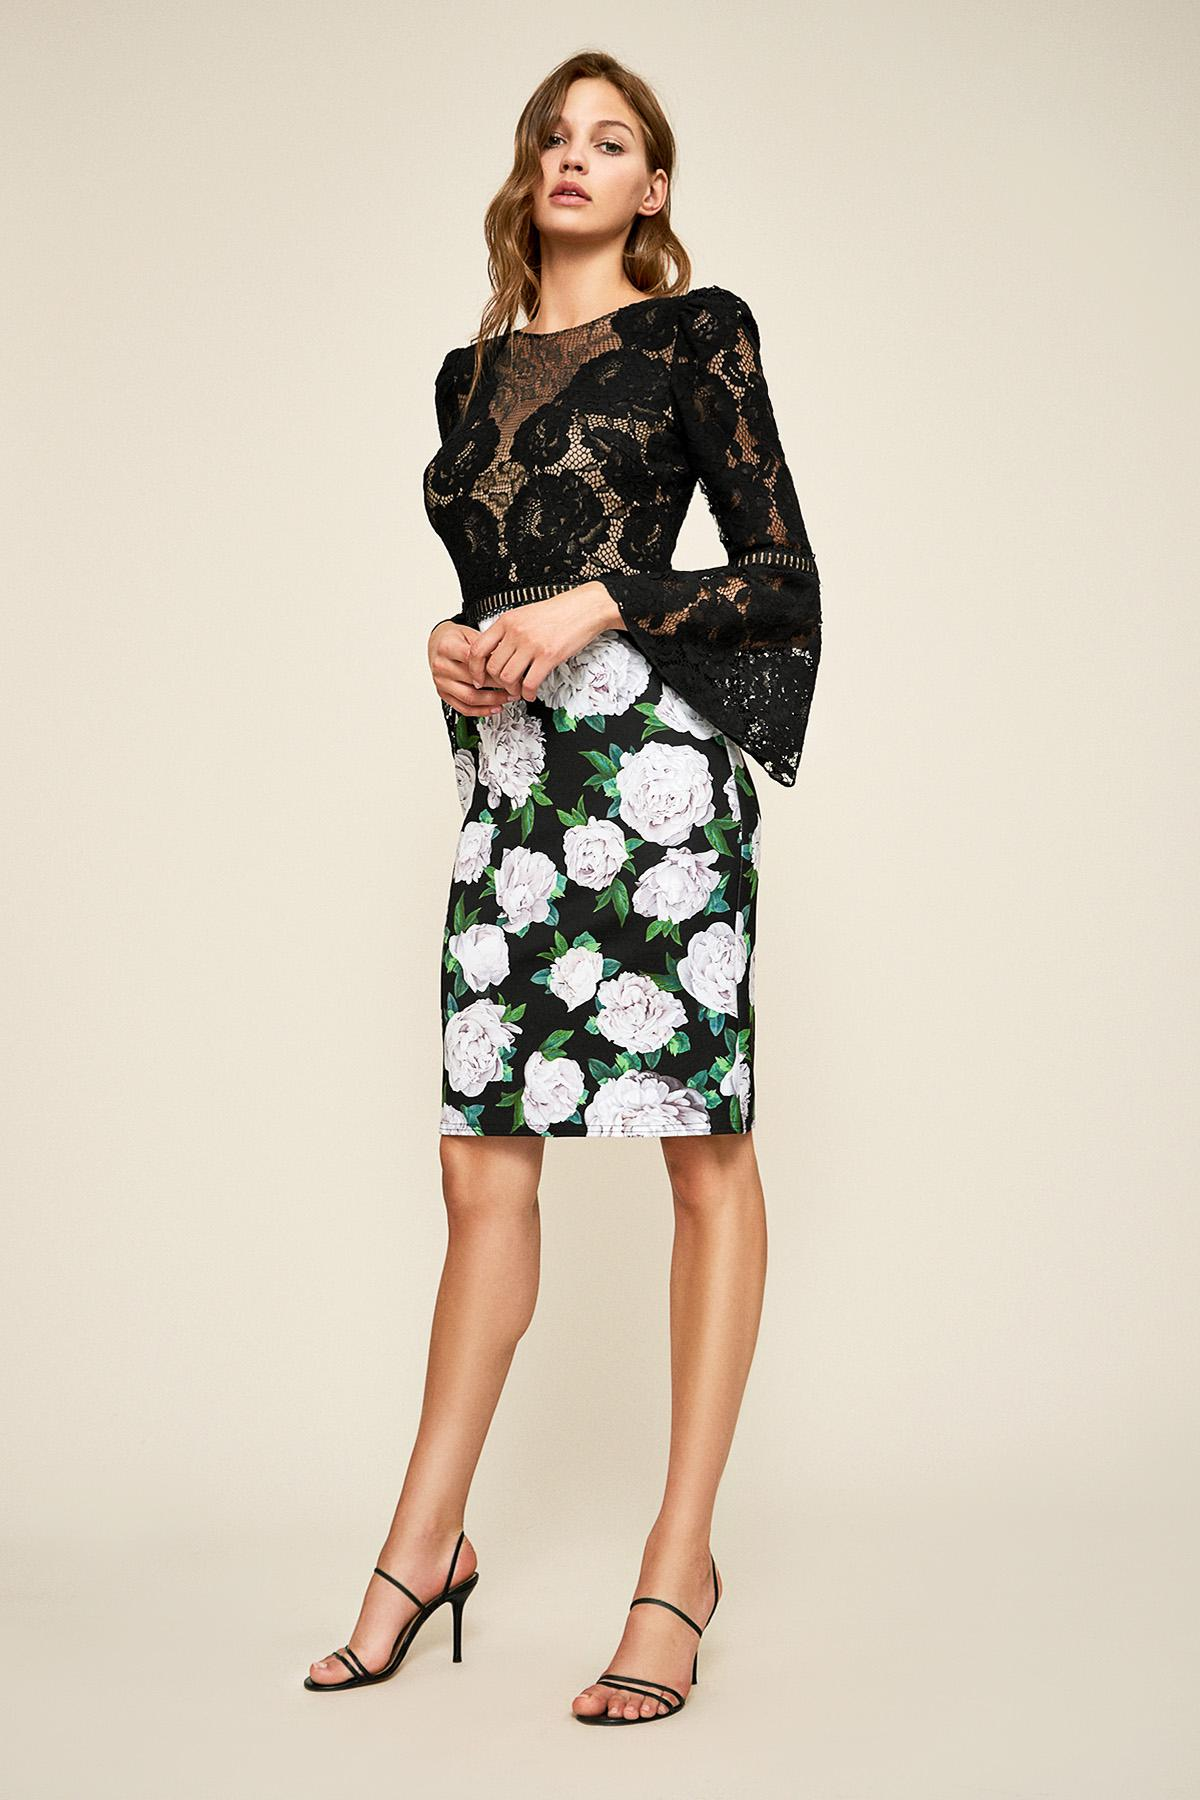 82efccd966a3 Lyst - Tadashi Shoji Gower Floral Neoprene Dress in Black - Save 43%